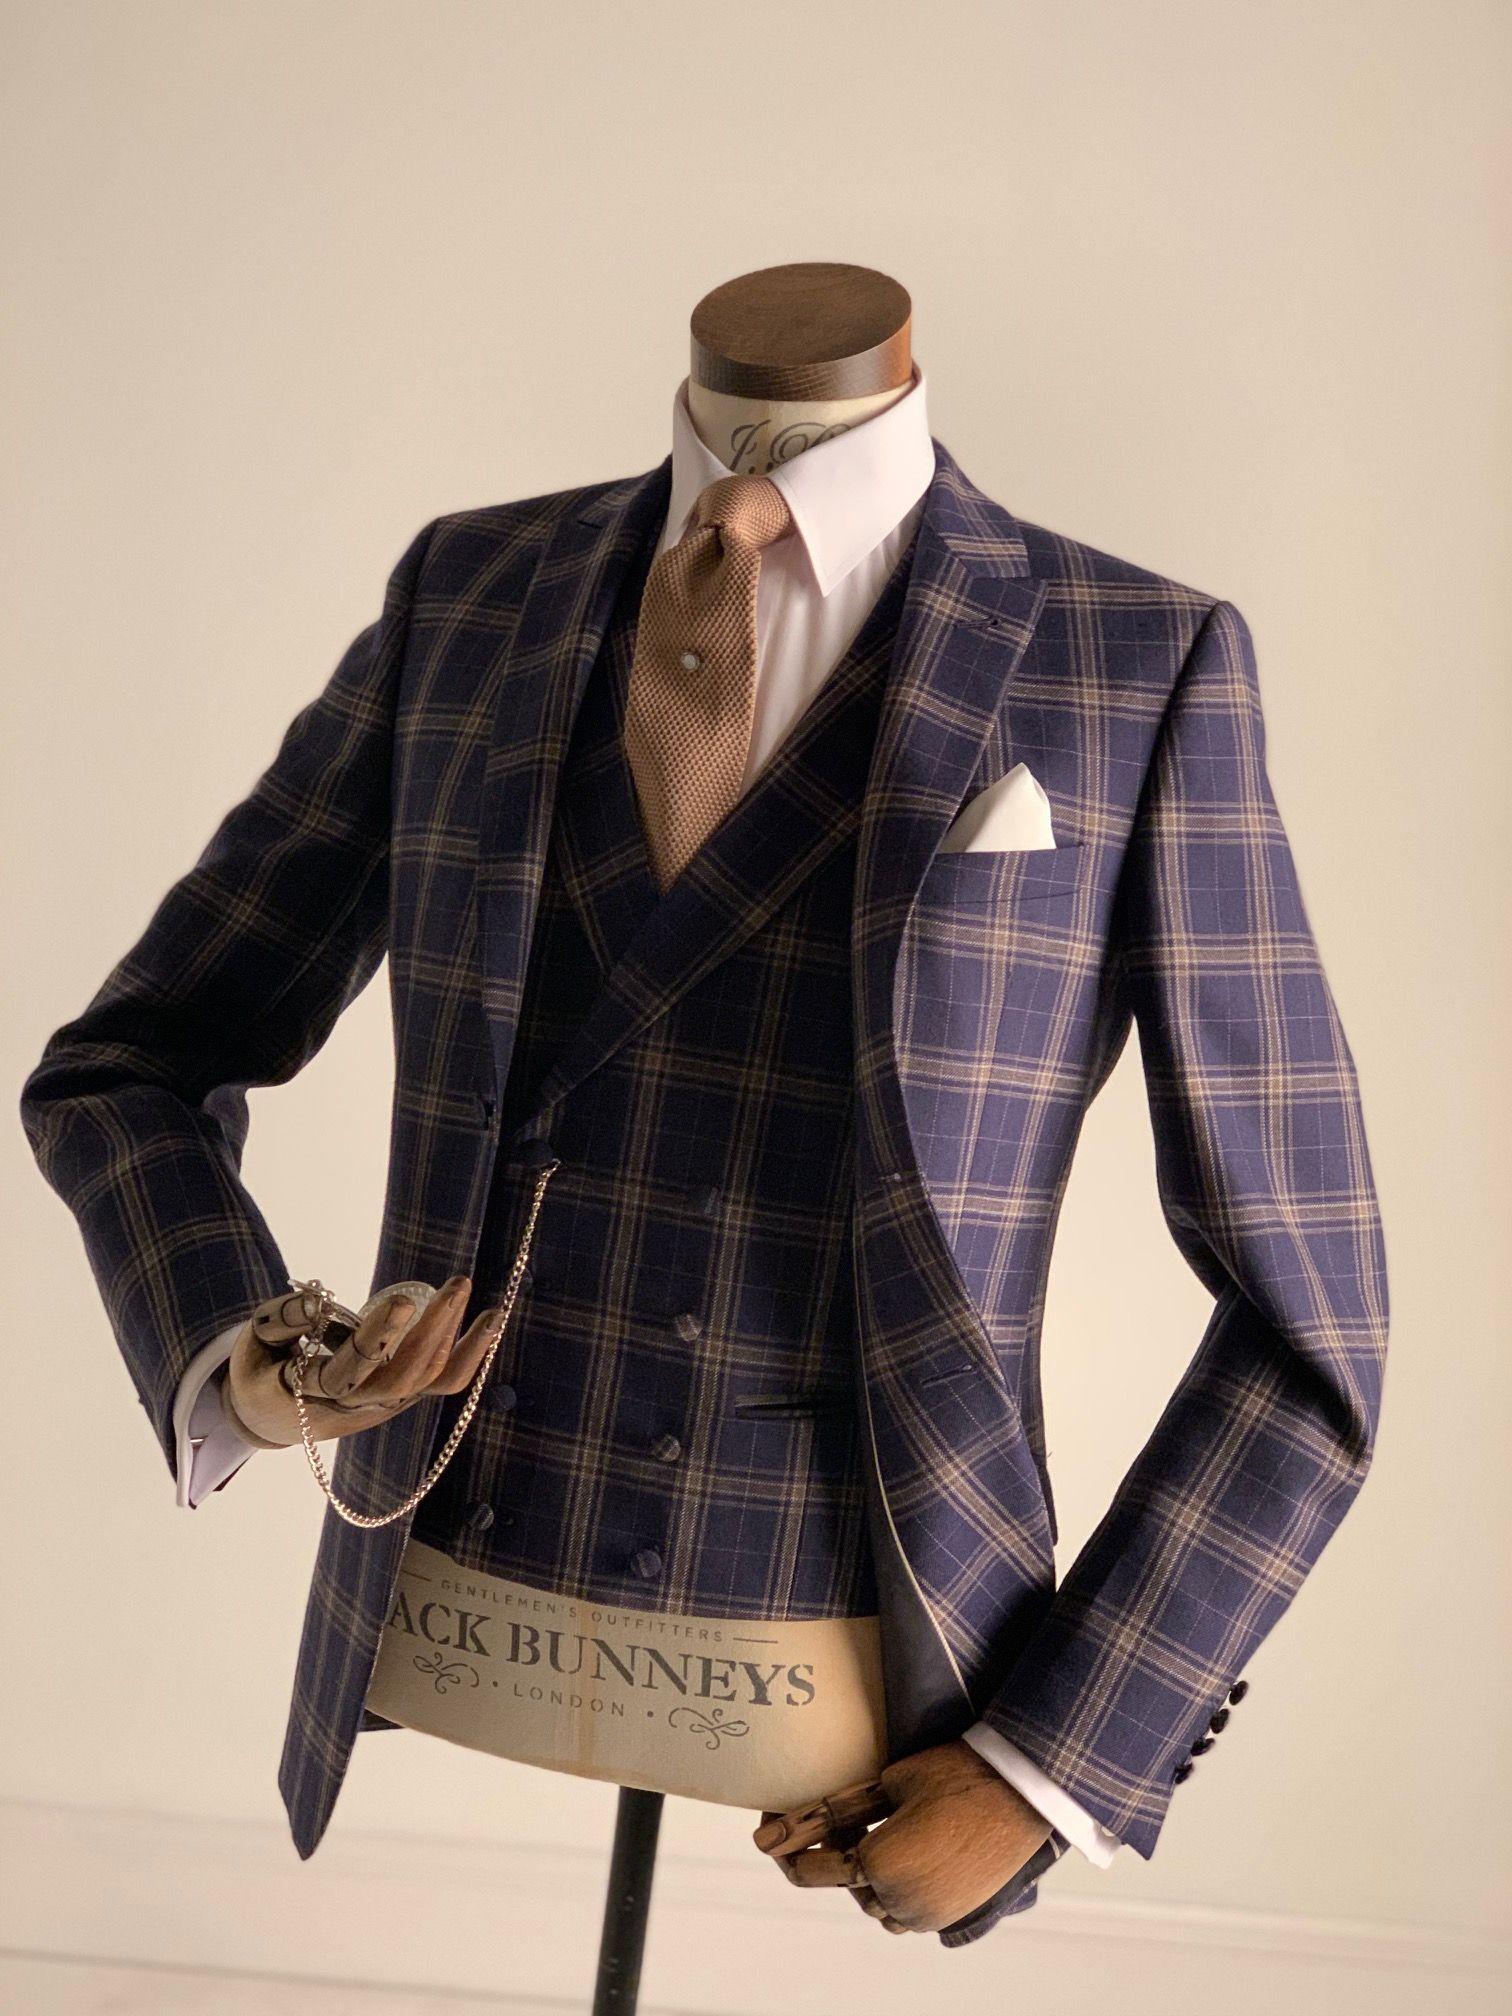 Wedding Suit Hire 2020 in 2020 Designer suits for men